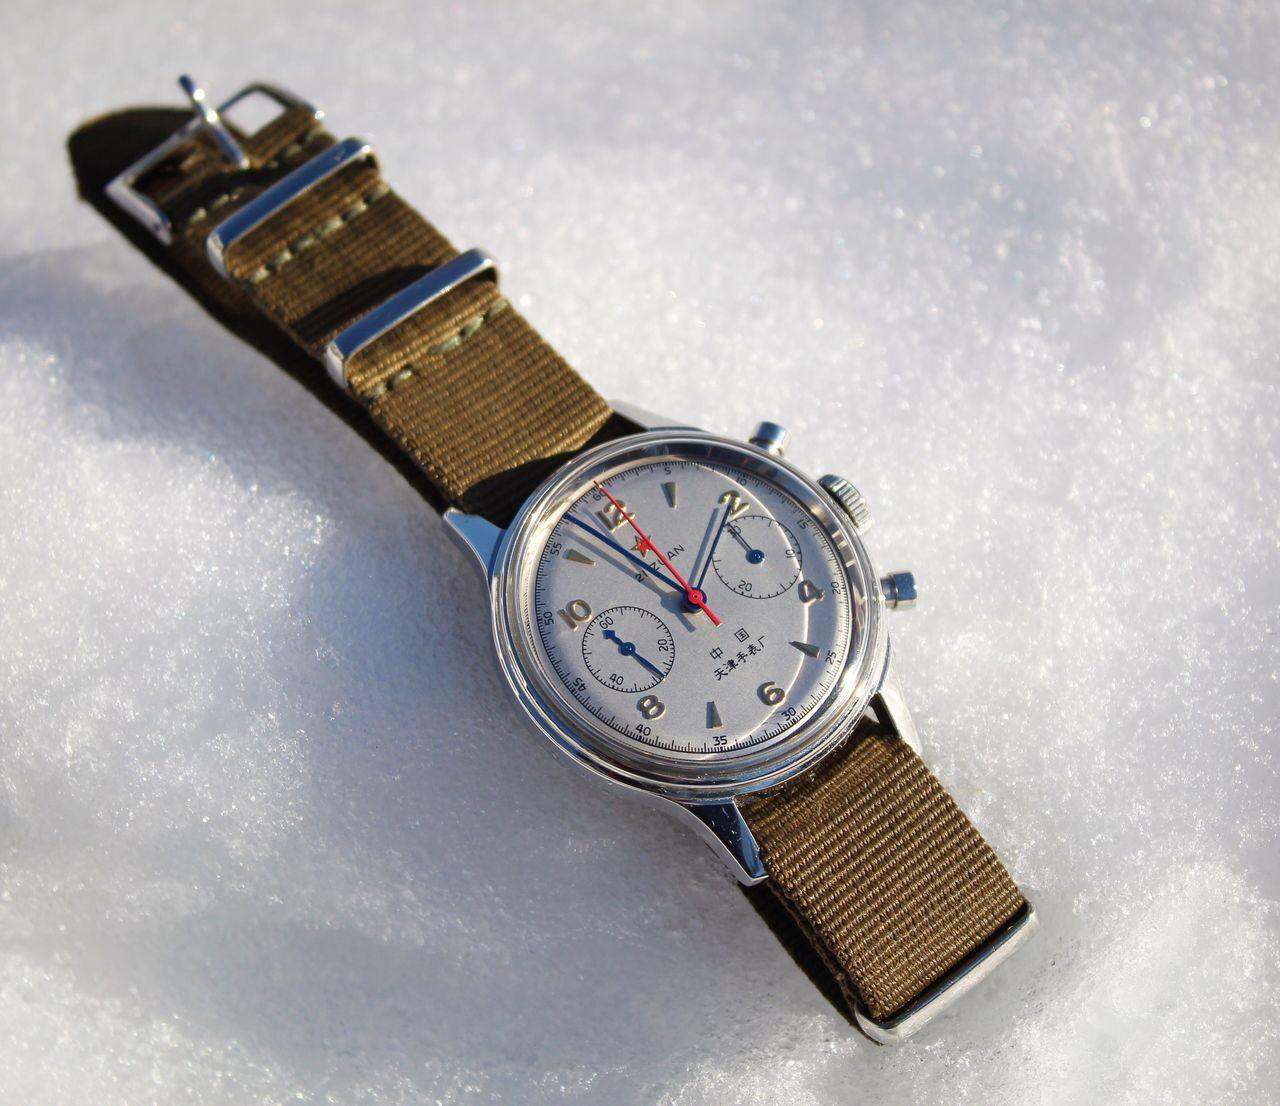 Seagull 1963 Watch Snow Wristwatch Watches Watchporn Ticking Winter Seagull 1963